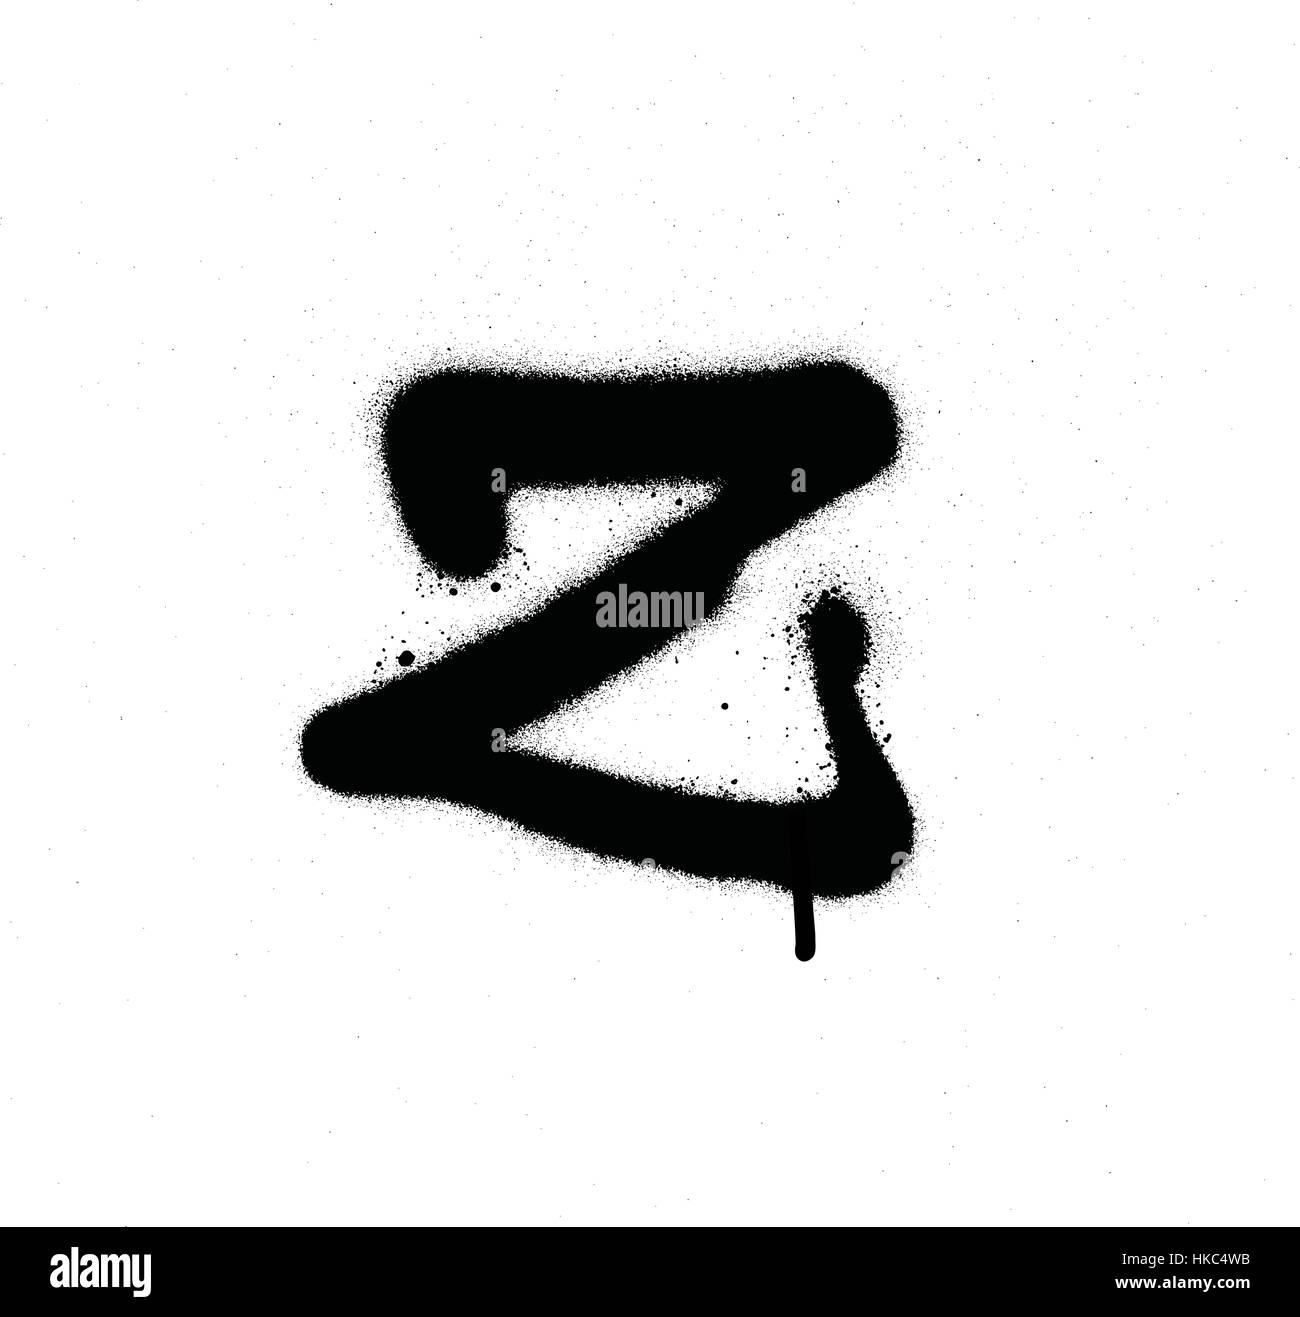 Sprayed z font graffiti with leak in black over white